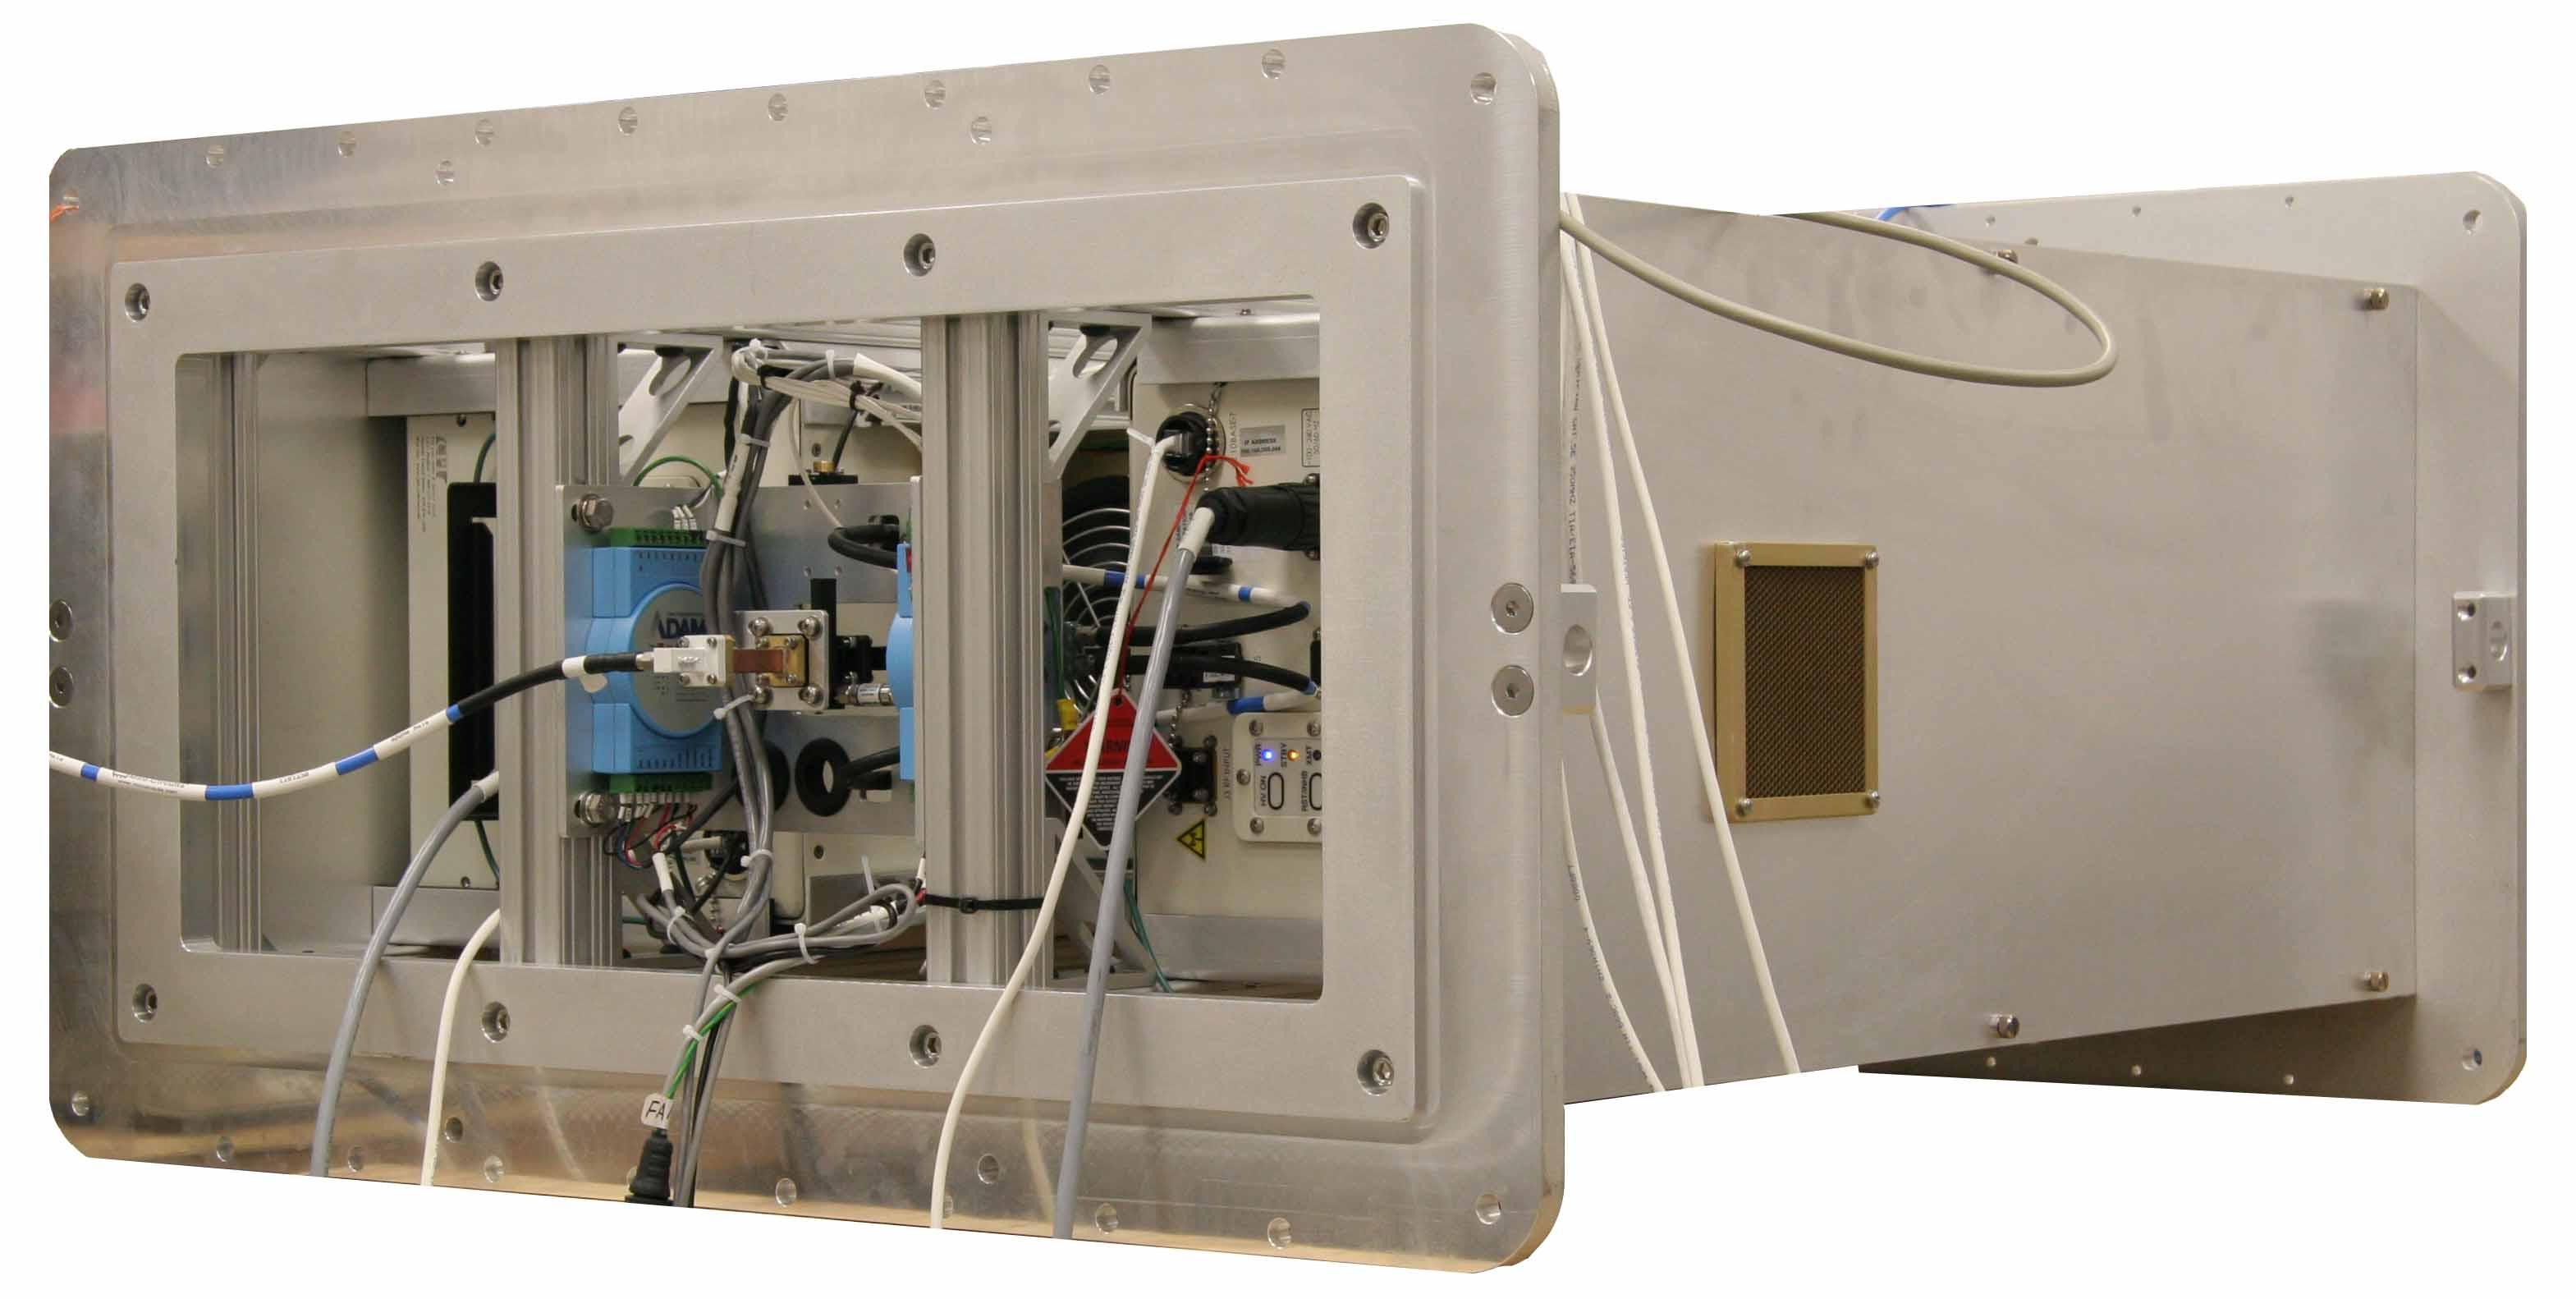 Ka Band 525w Twta High Power Amplifier System Unique Broadband Systems 300w Schematic Diagram Medium Side Box